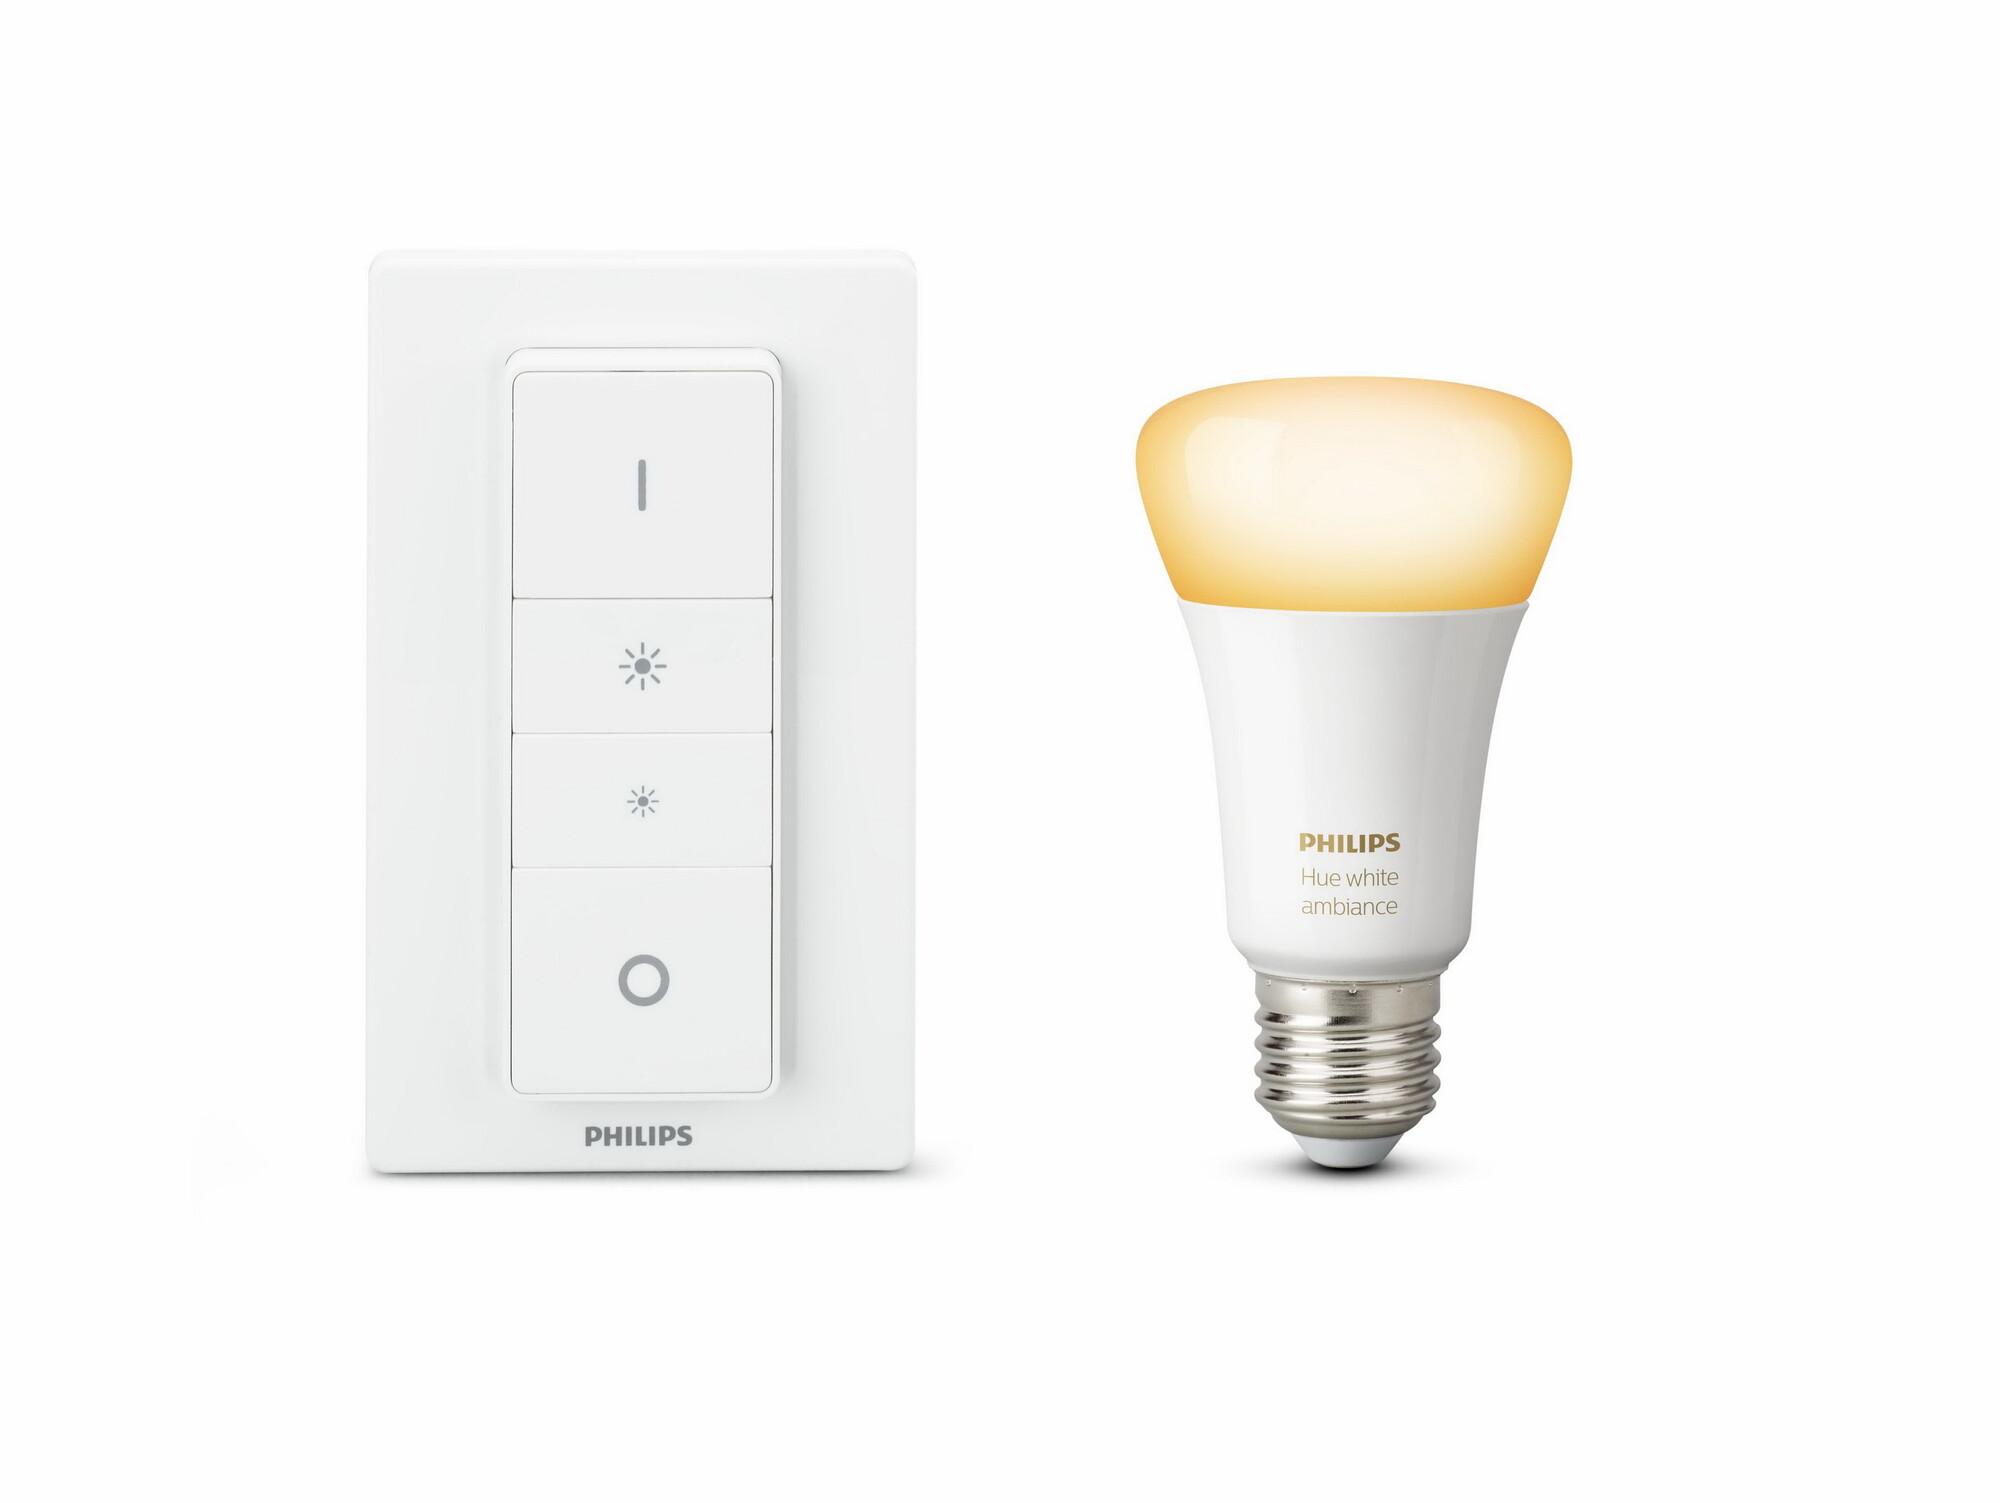 Philips HUE White ambiance E27 9,5W 806lm 2200K-6500K